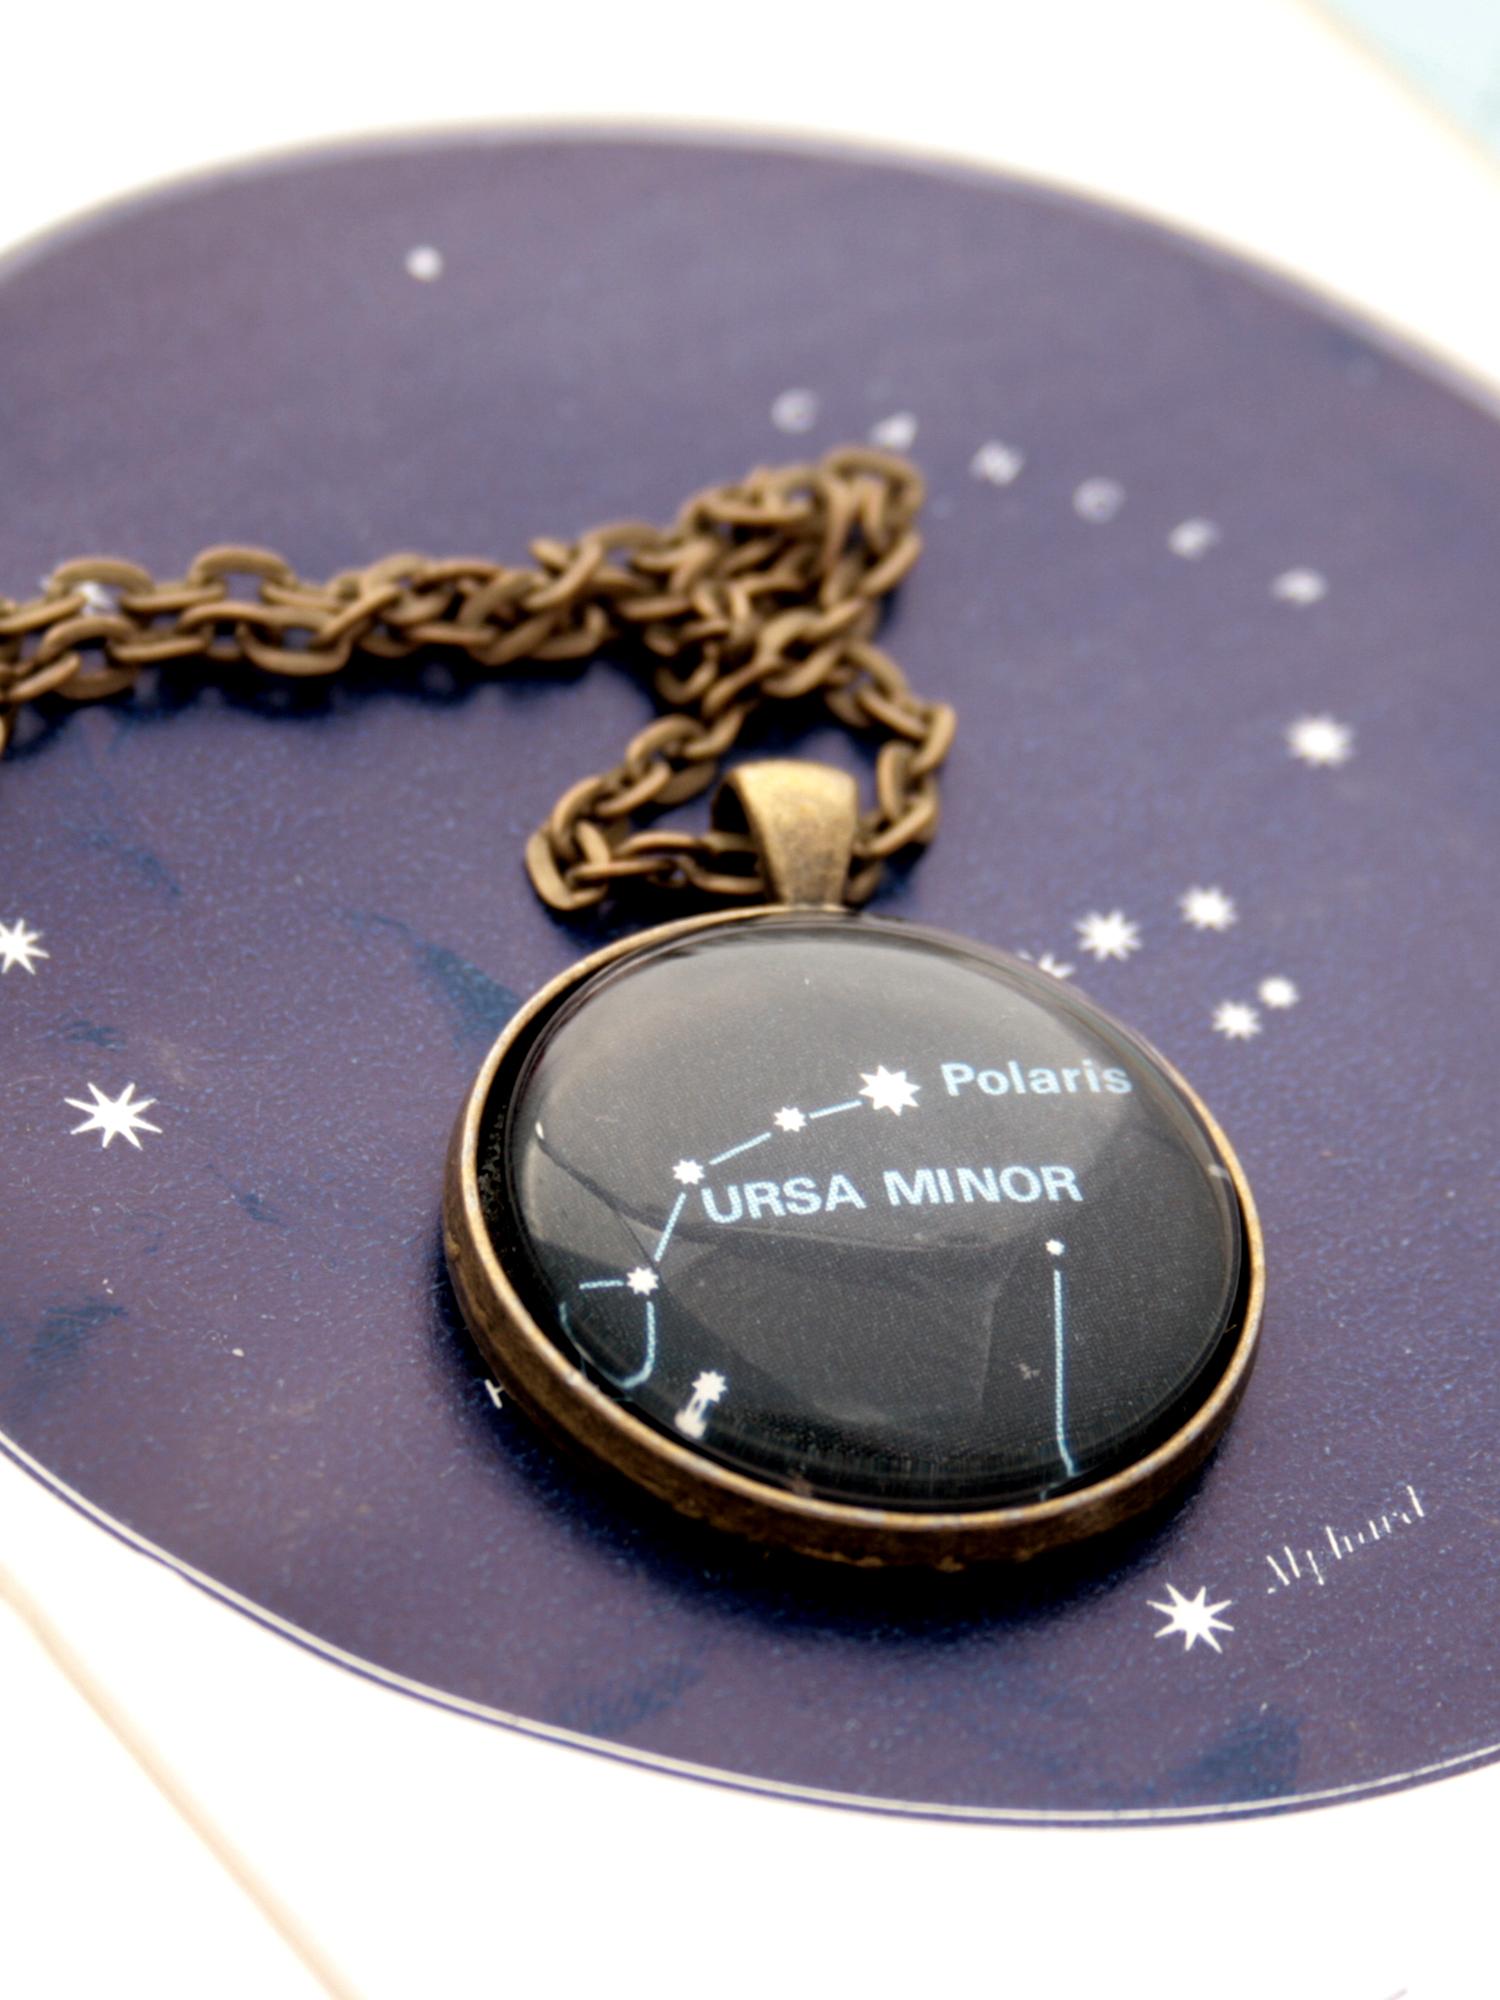 Ursa Minor necklace